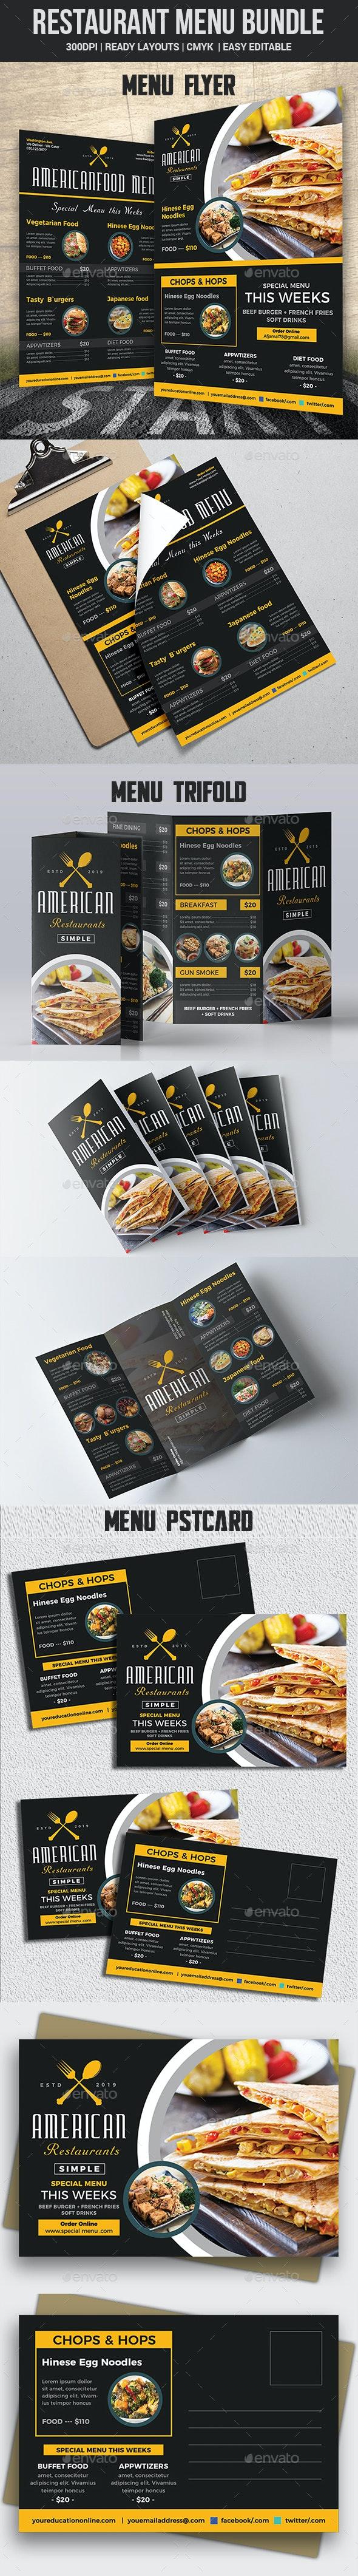 Restaurant Menu Bundle Templates - Food Menus Print Templates